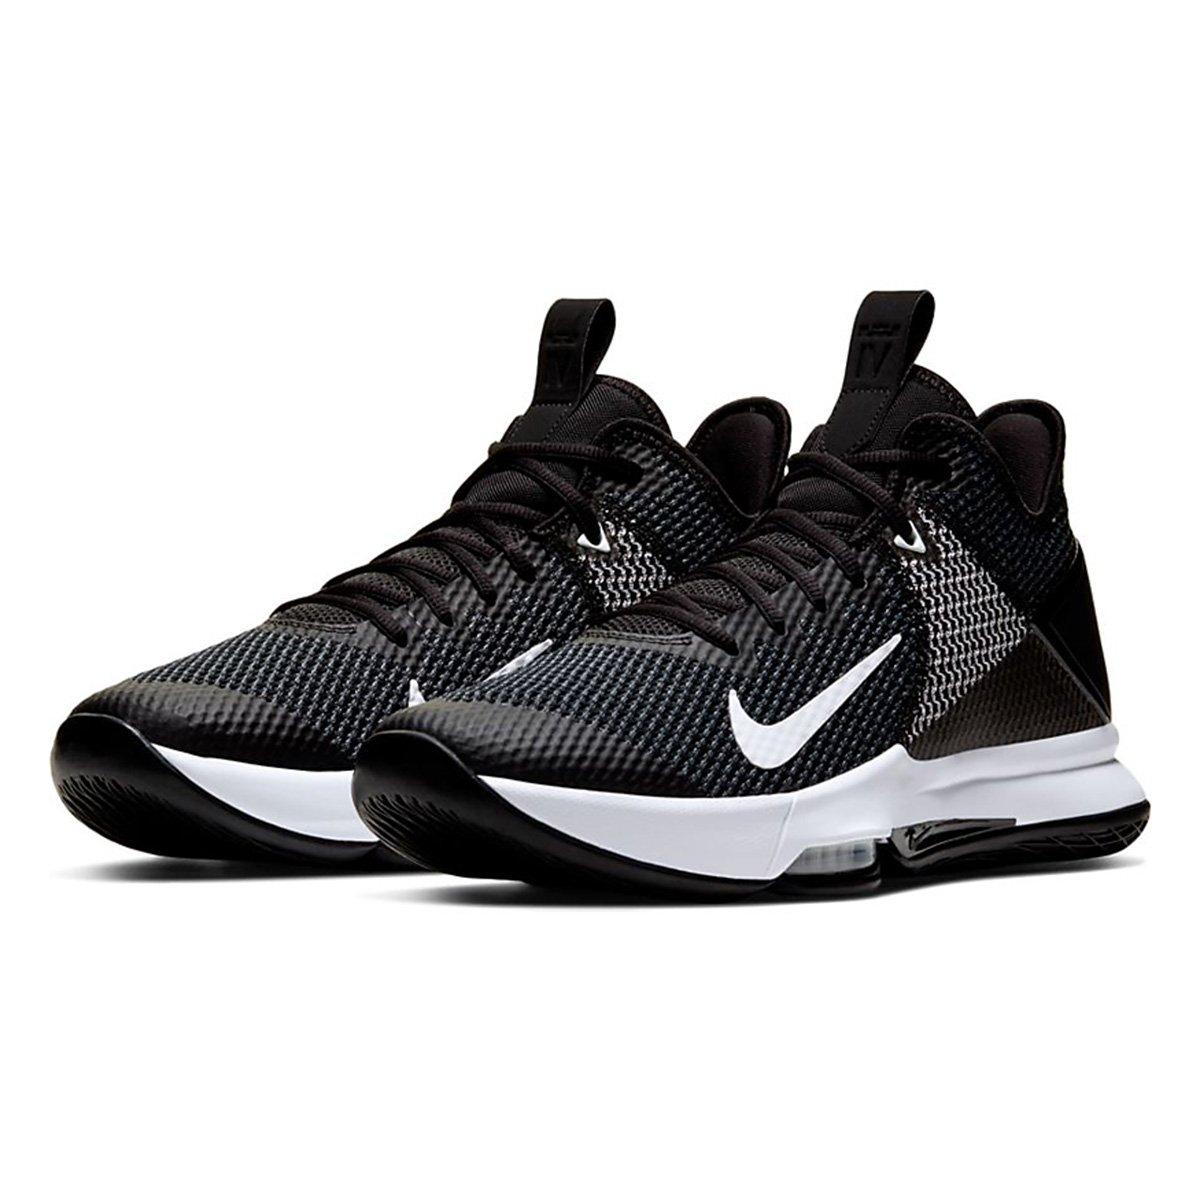 Bandido Pequeño Multitud  Tênis Nike Lebron Witness IV Masculino - Preto e Branco | Netshoes